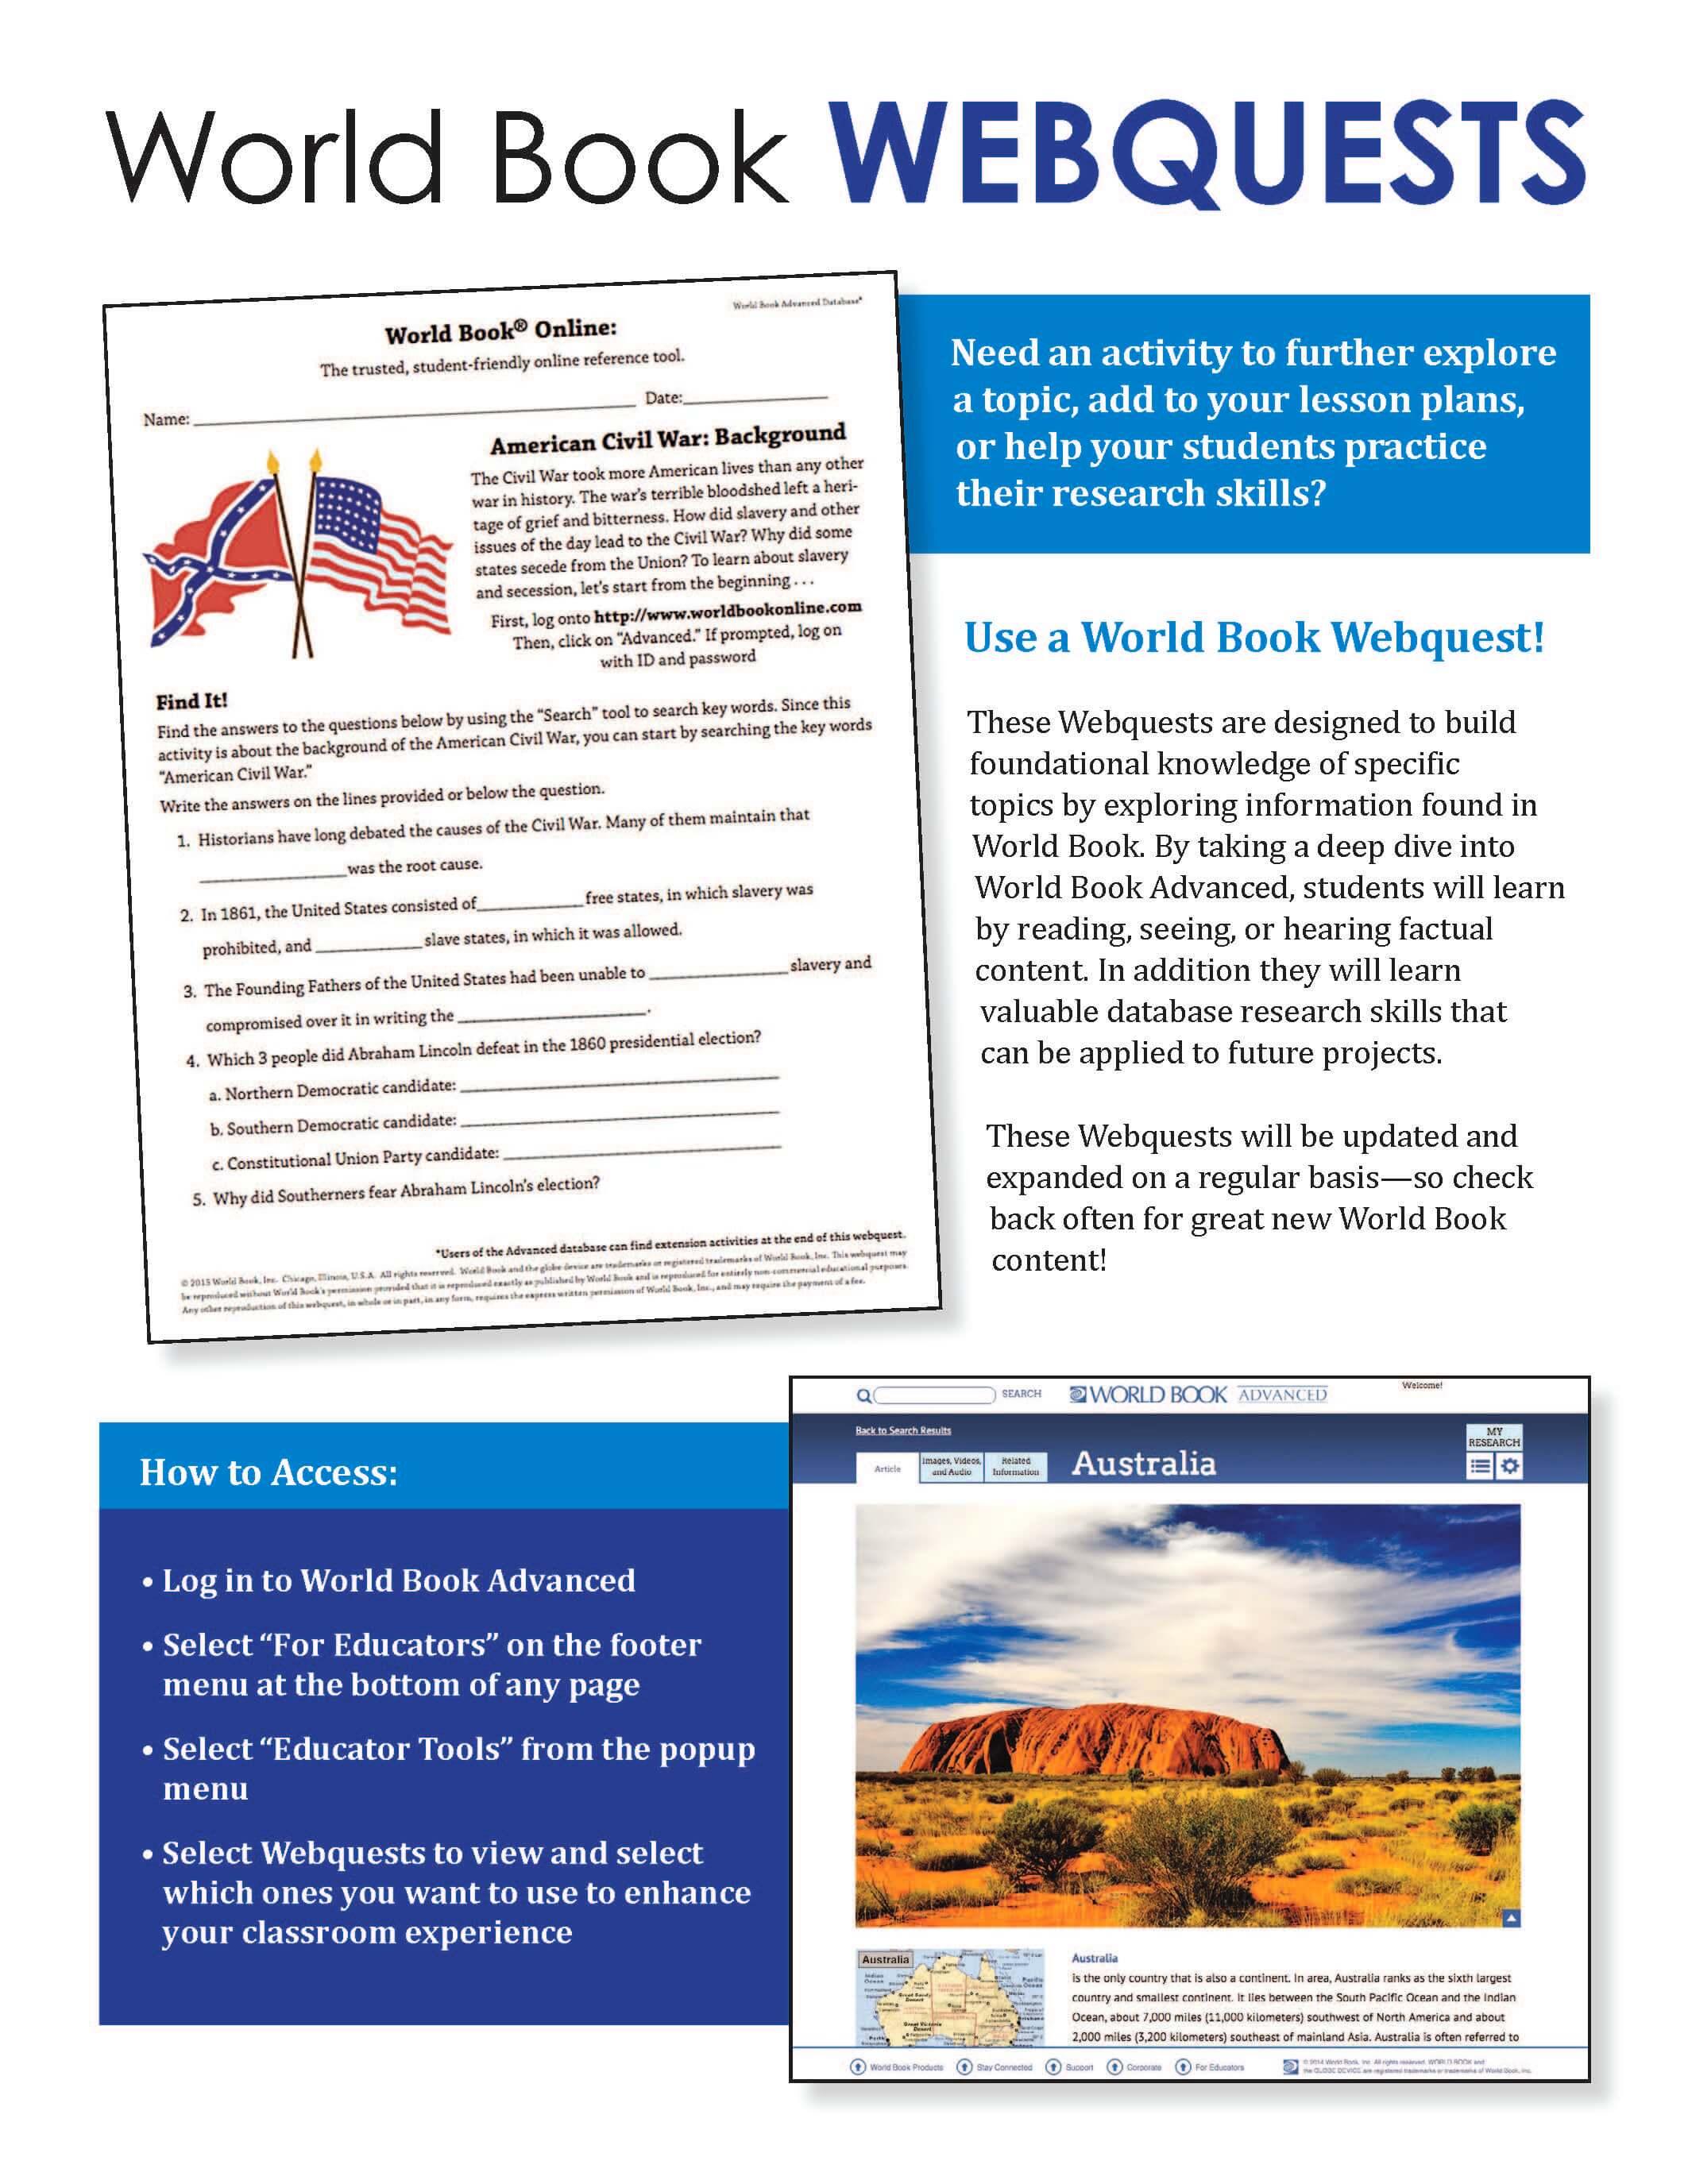 Advanced WebQuest